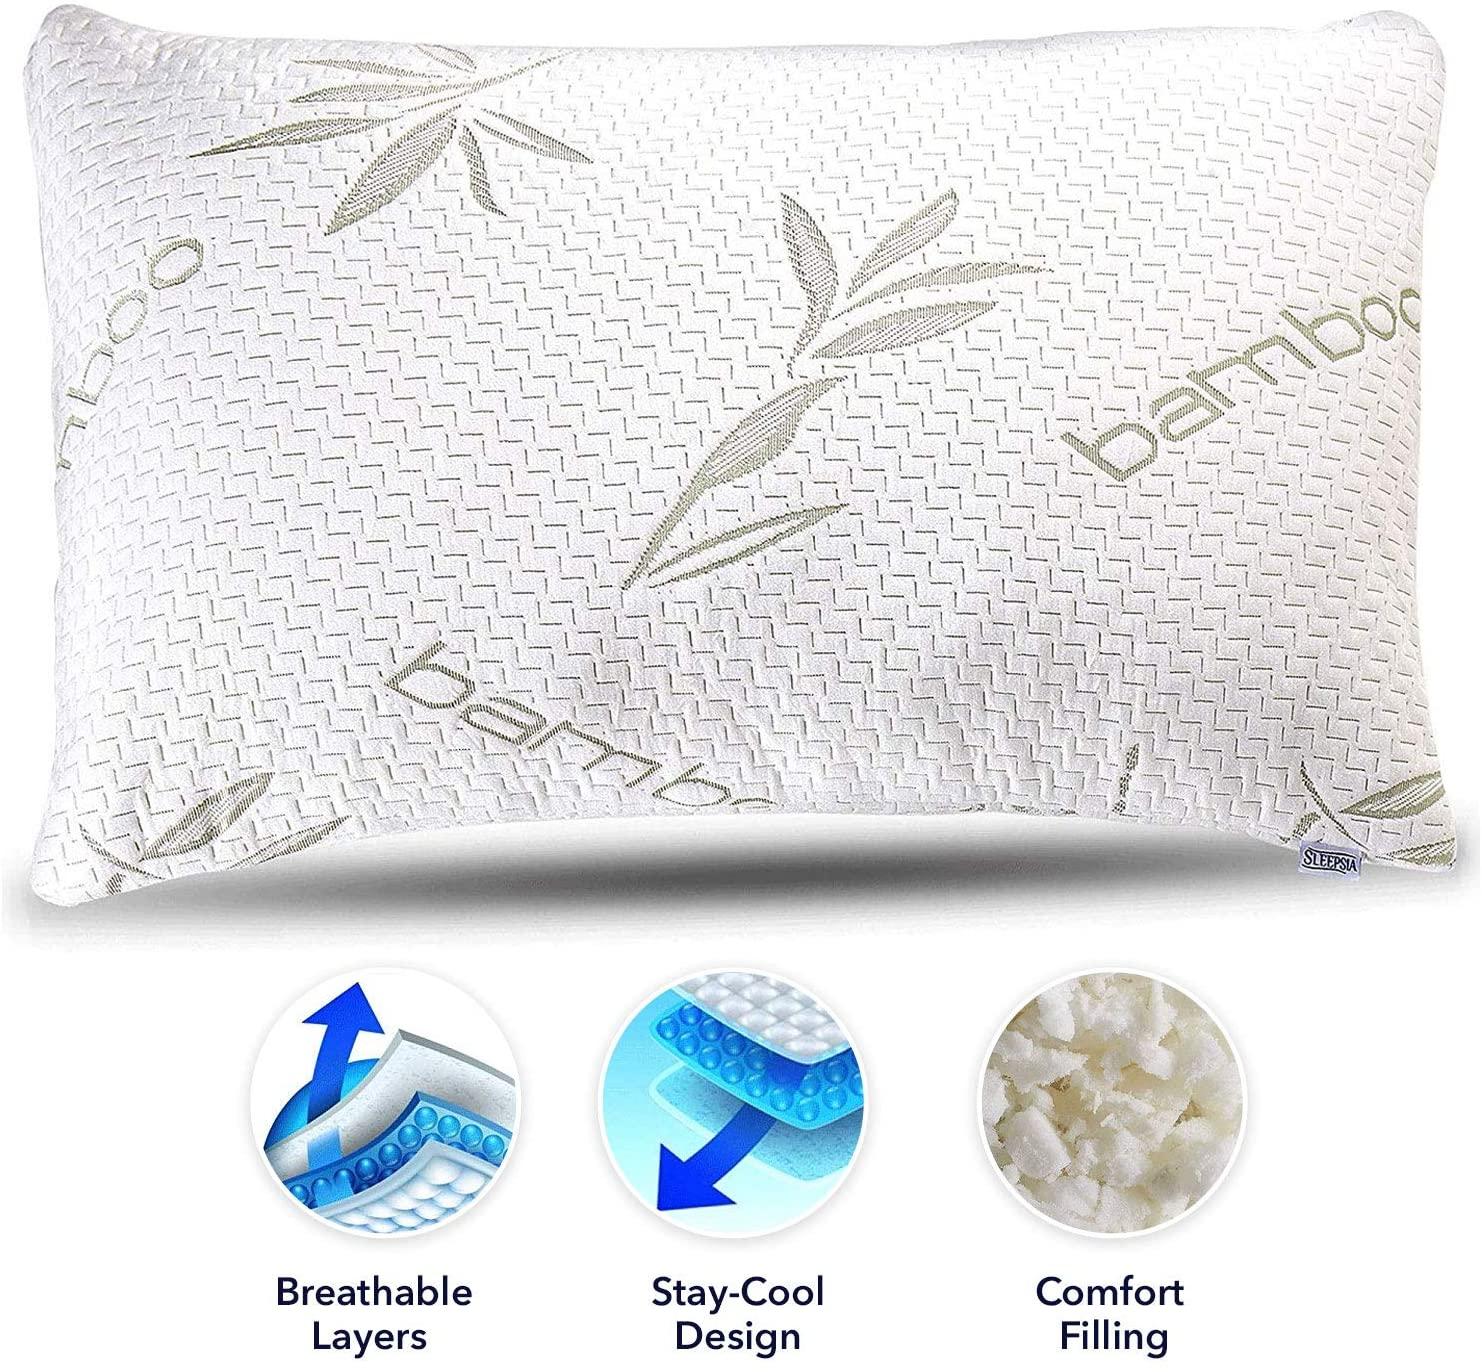 Sleepsia Bamboo Pillow - Premium Pillows for Sleeping - Memory Foam Pillow with Pillow Case - King Size Pillow (King)